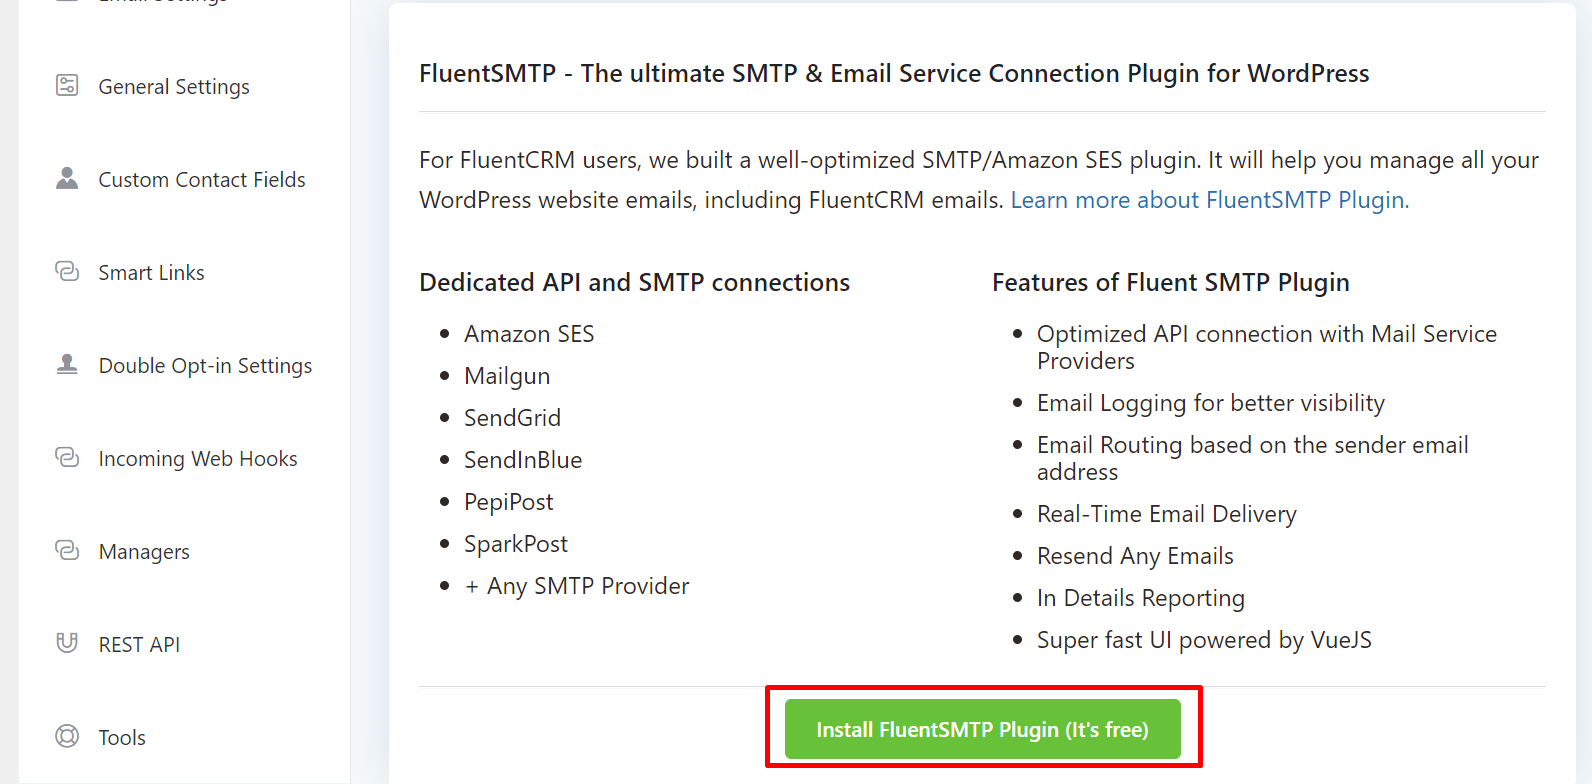 installing fluentsmtp from fluentcrm